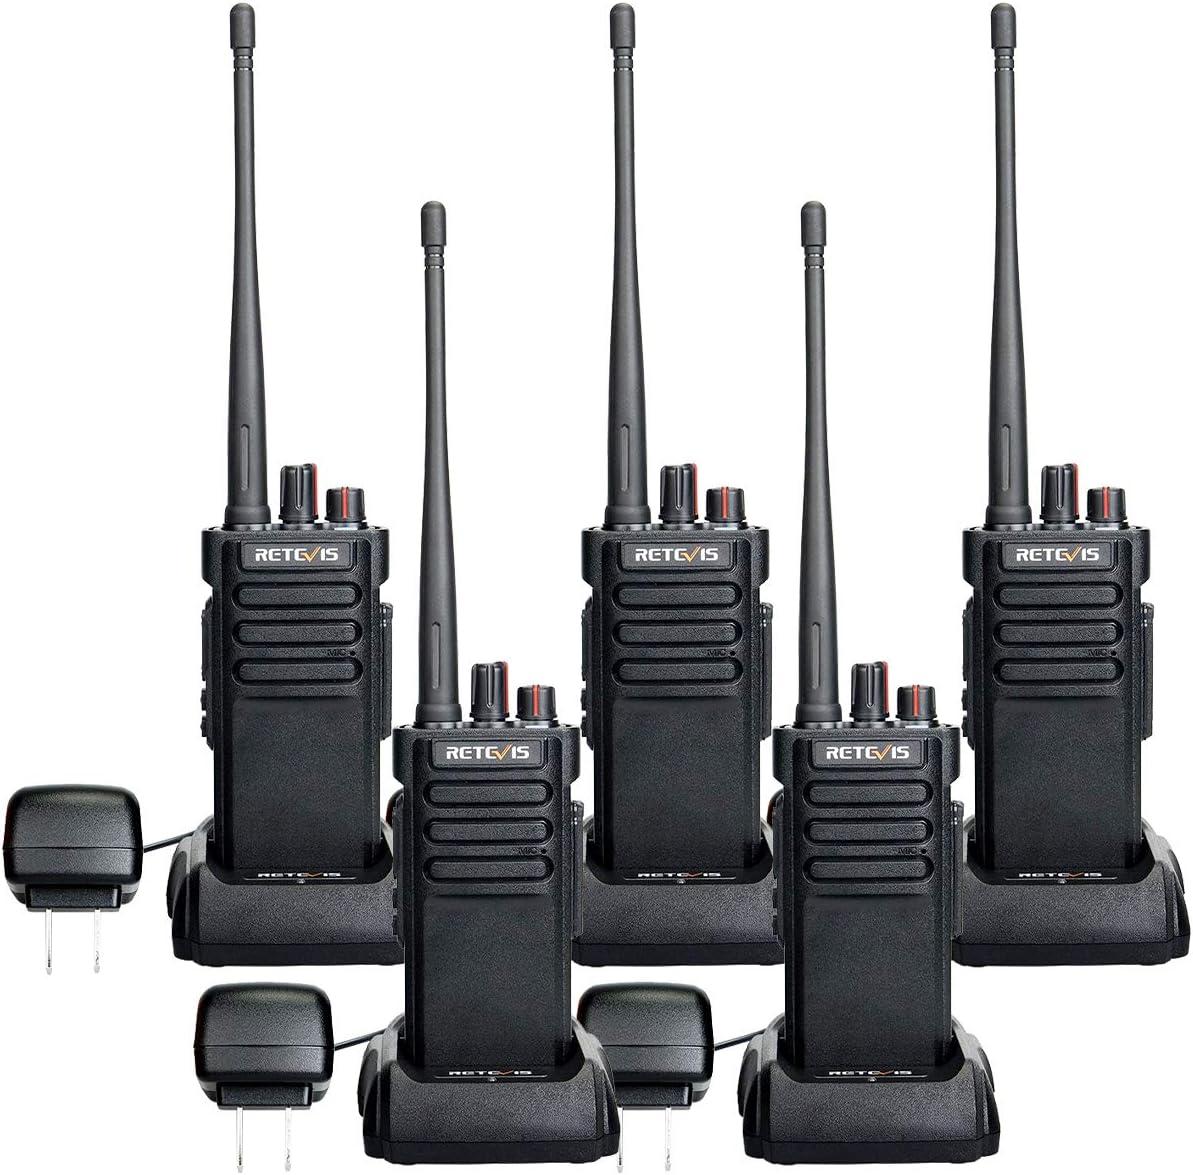 Retevis RT29 Two-Way Radios Long Range Rechargeable 3200mAh Waterproof UHF Heavy Duty High Power Walkie Talkies Long Distance 5 Pack